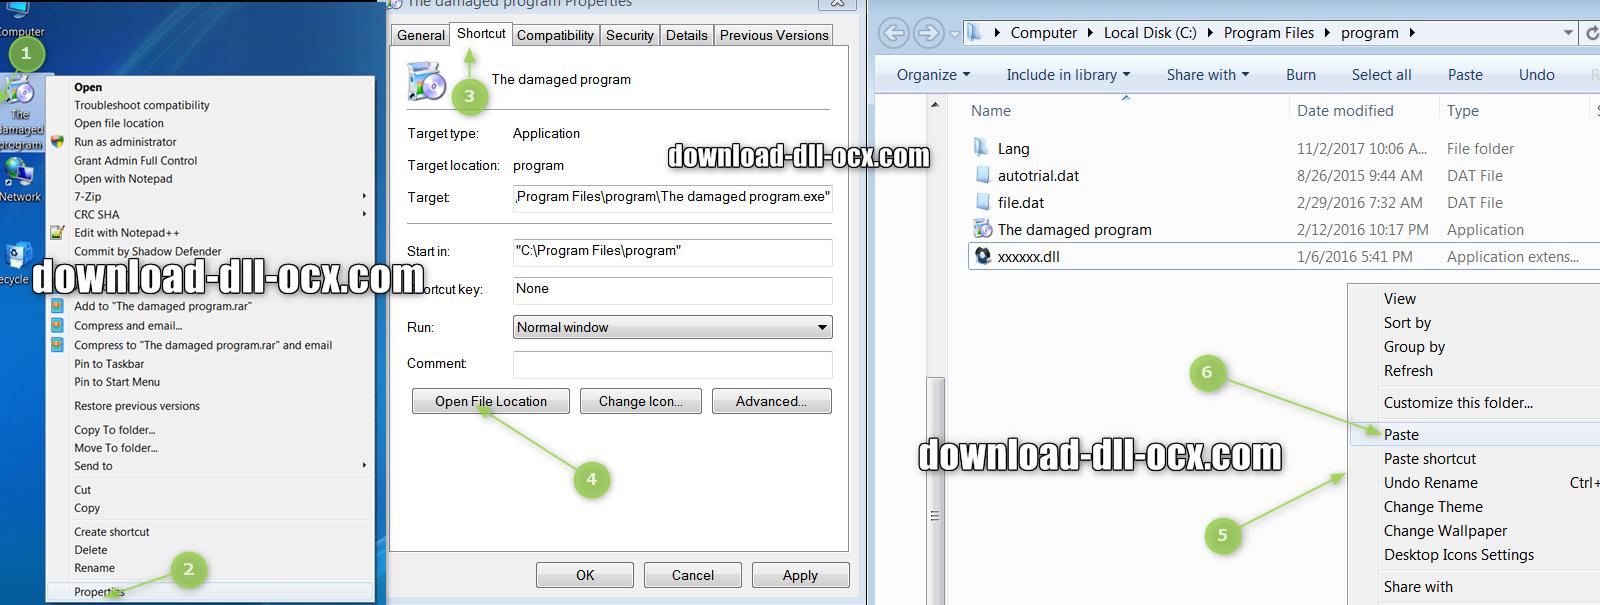 how to install jgedgen.dll file? for fix missing